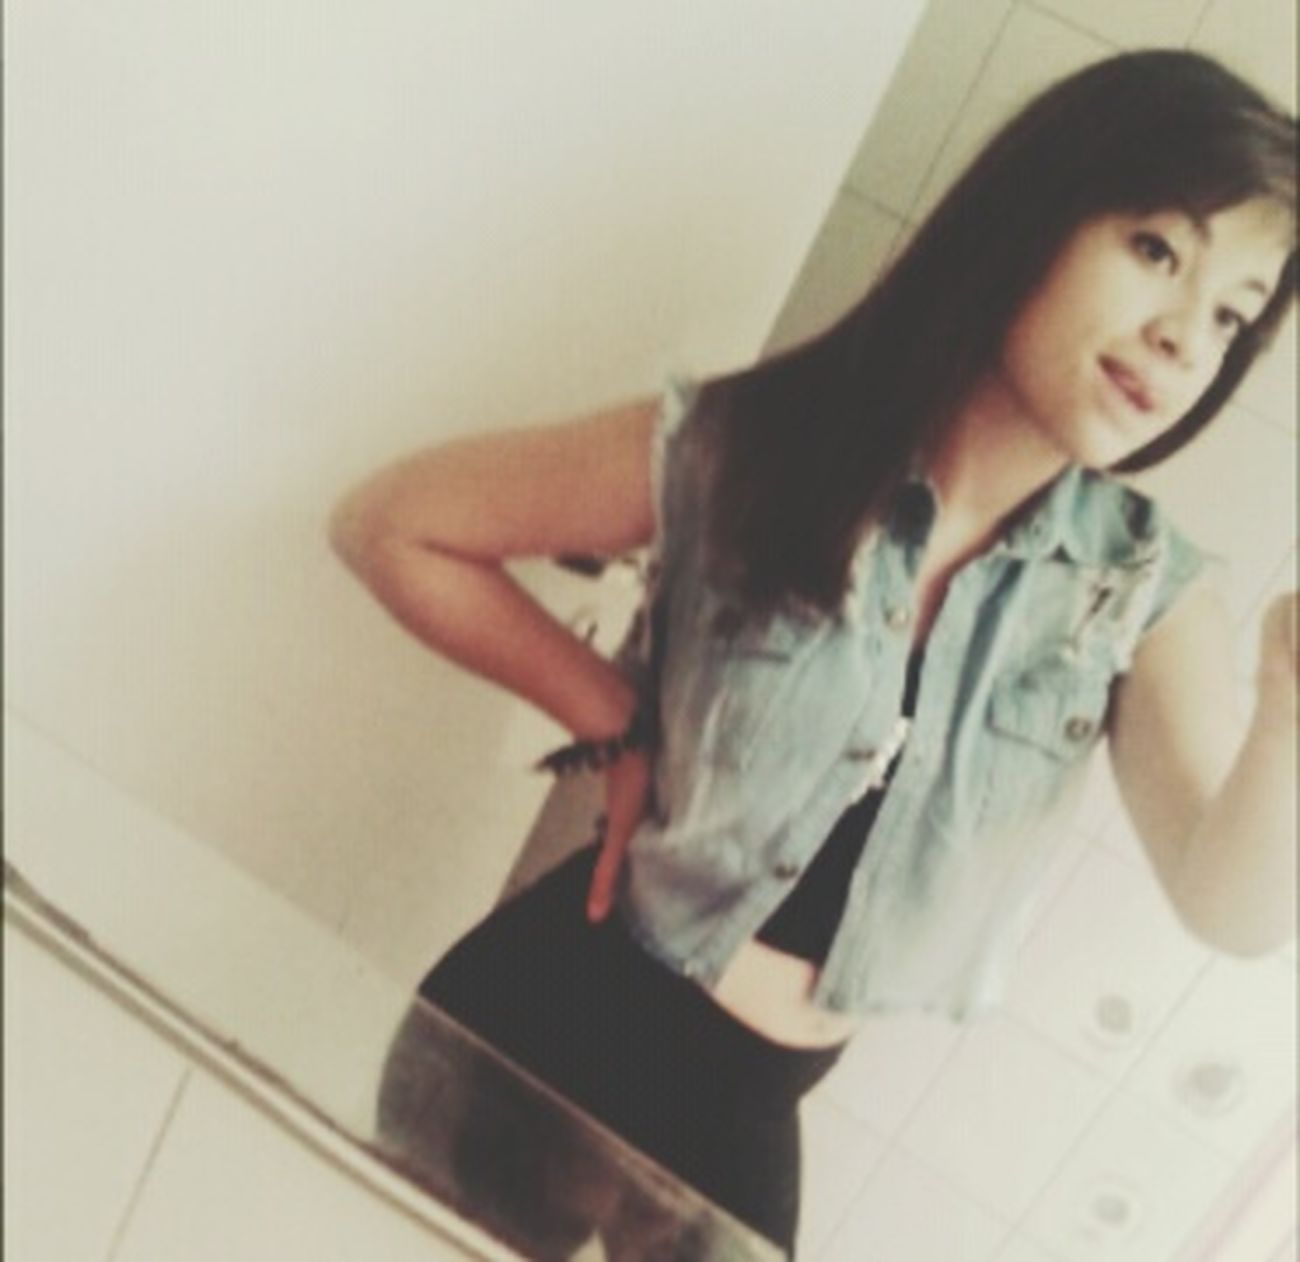 Today ♥ Cheese! Hello World Kisses ♥ Enyoing Myself 2015❤✔